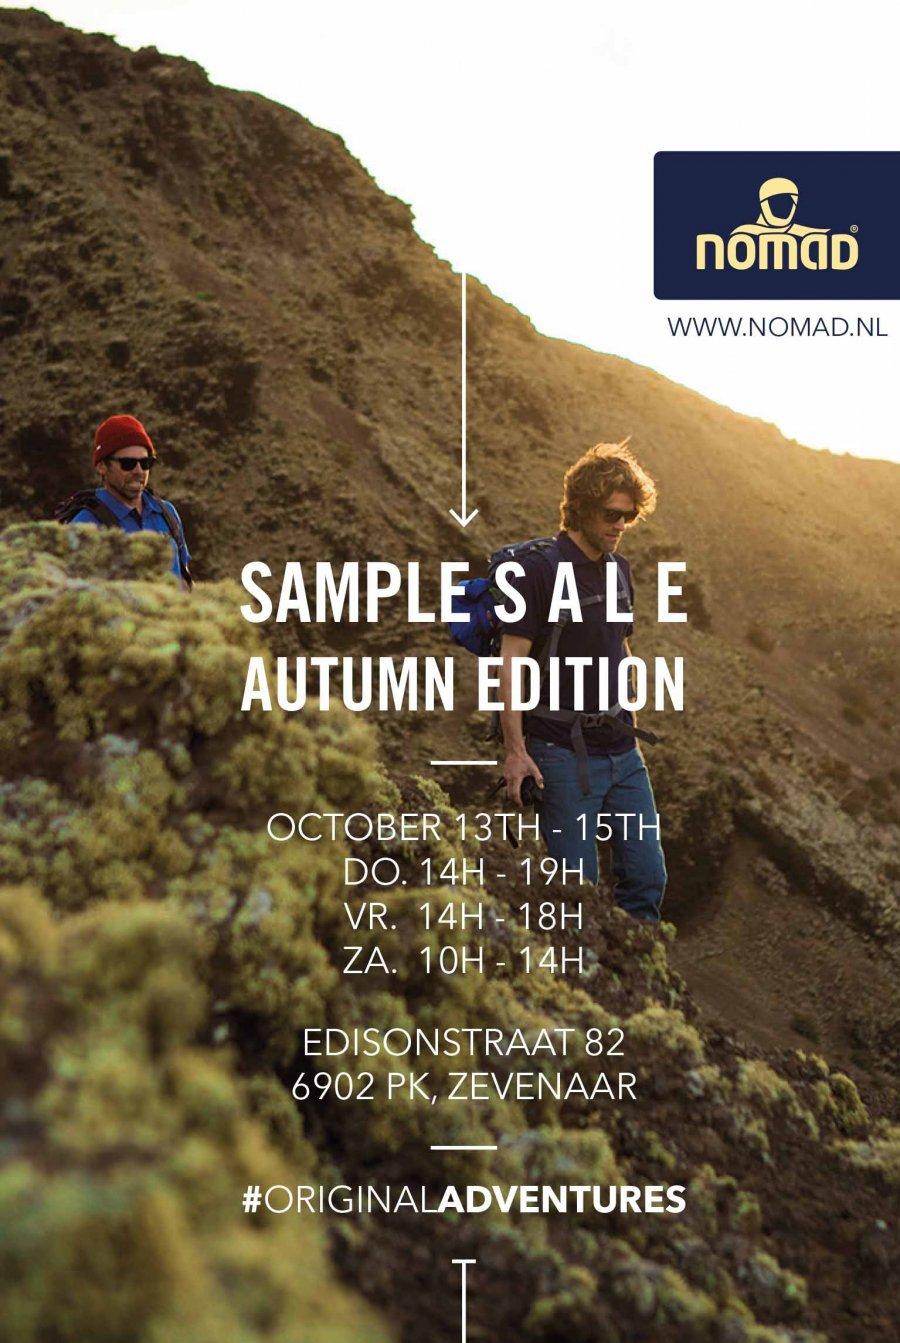 hoge kwaliteit 100% topkwaliteit horloge Nomad Autumn Sample Sale -- Sample Sale in Zevenaar